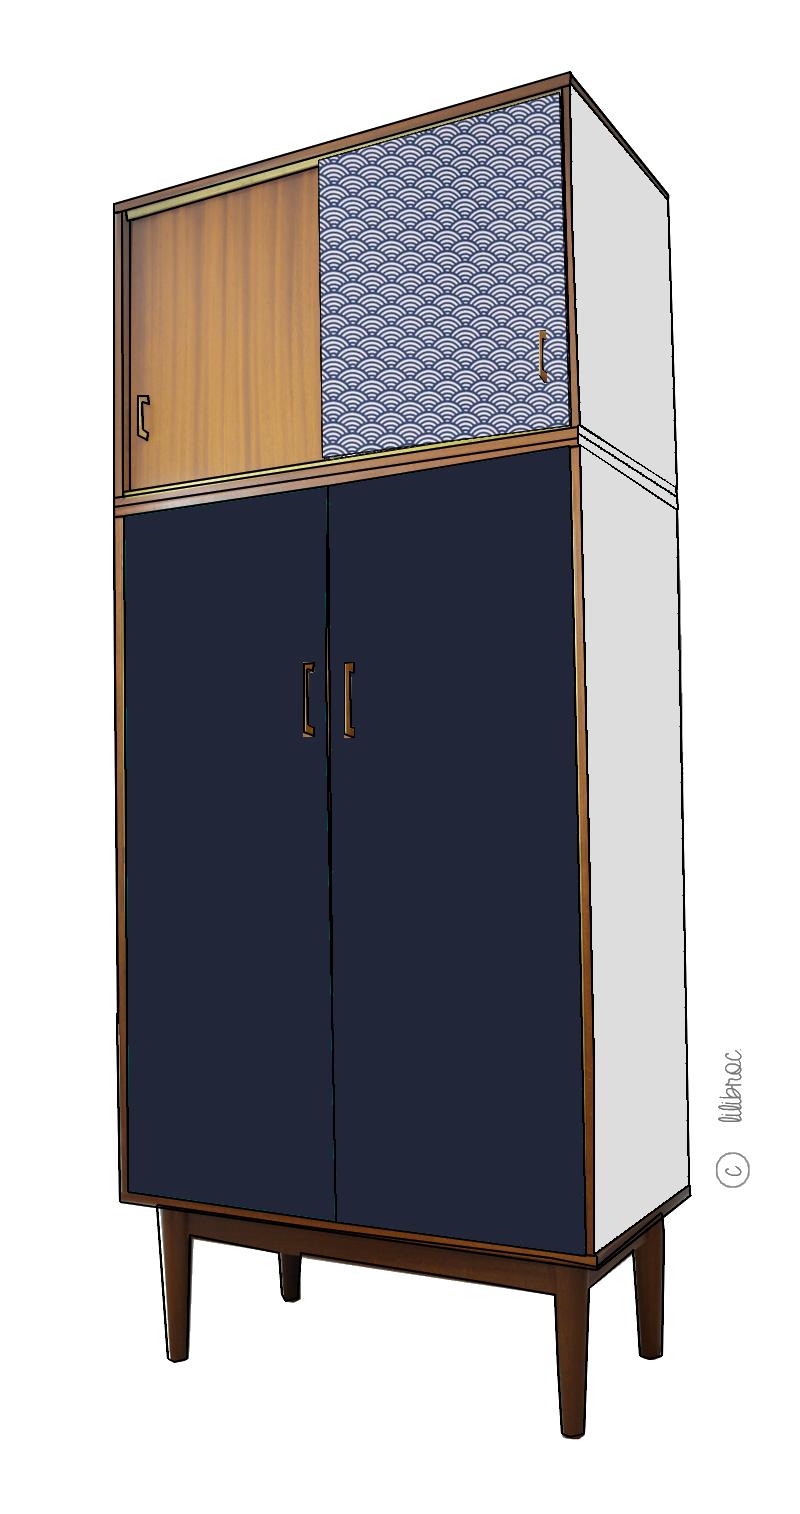 armoire-vintage-philomene-croquis-6